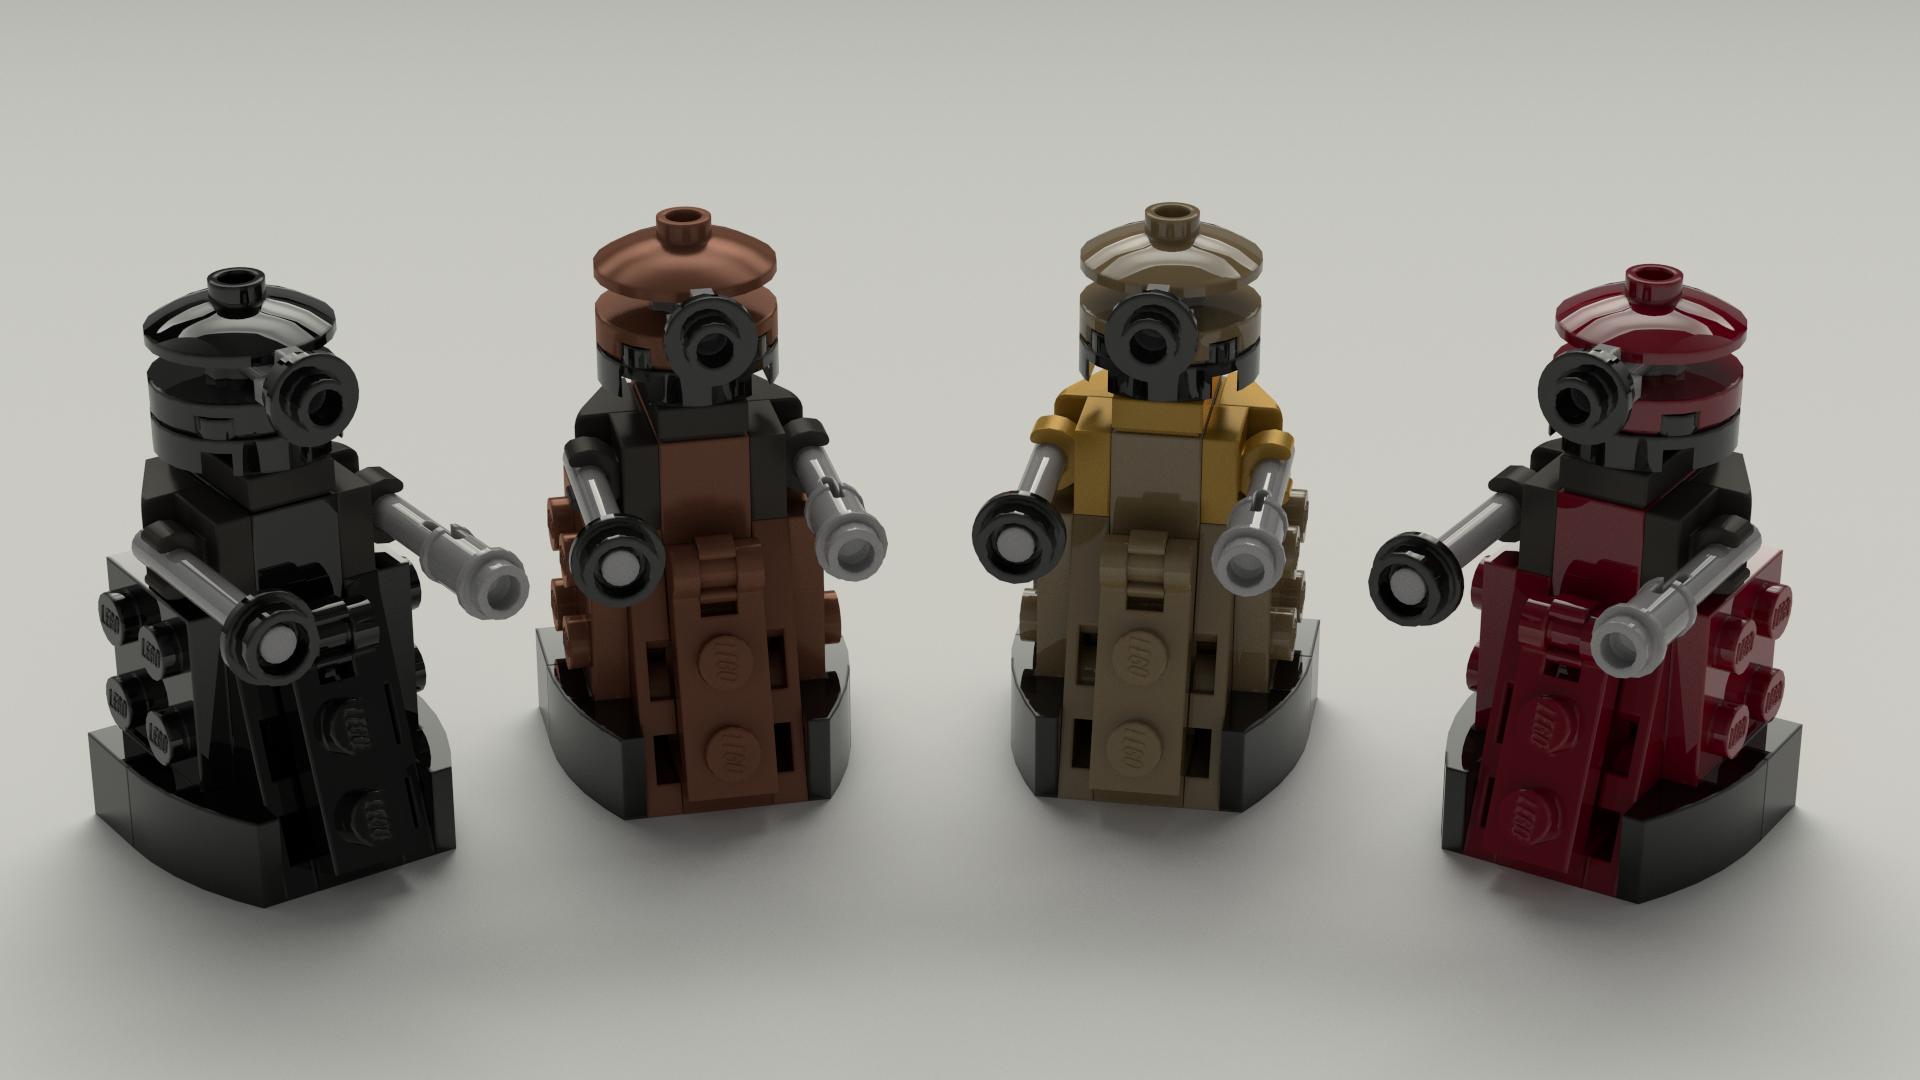 [Lego] Doctor Who sur CUUSOO - Page 2 21867231555_3727b31735_o